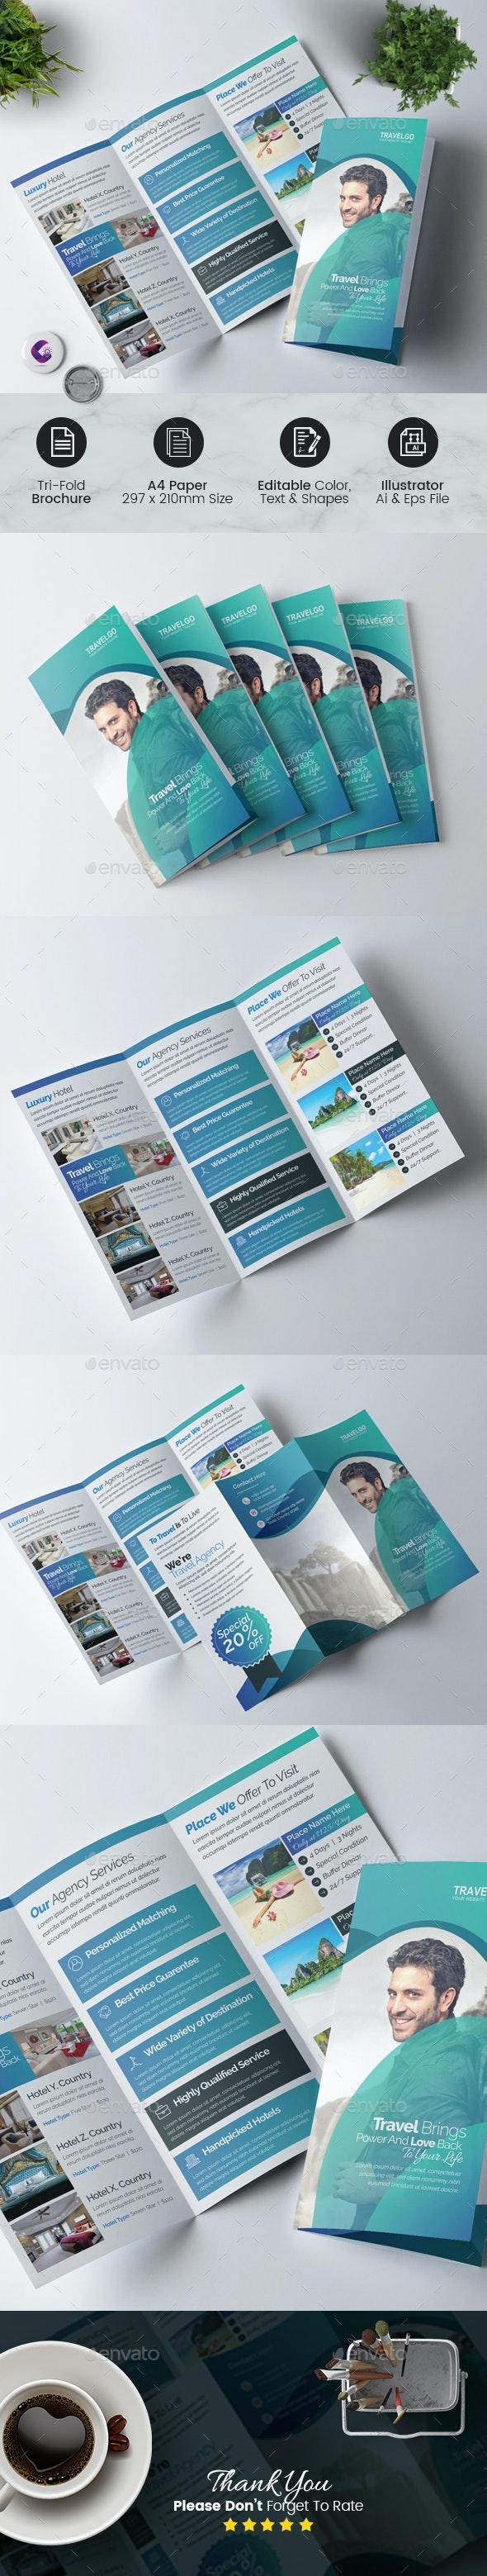 Travel Agency Tri-fold Brochure - Corporate Brochures